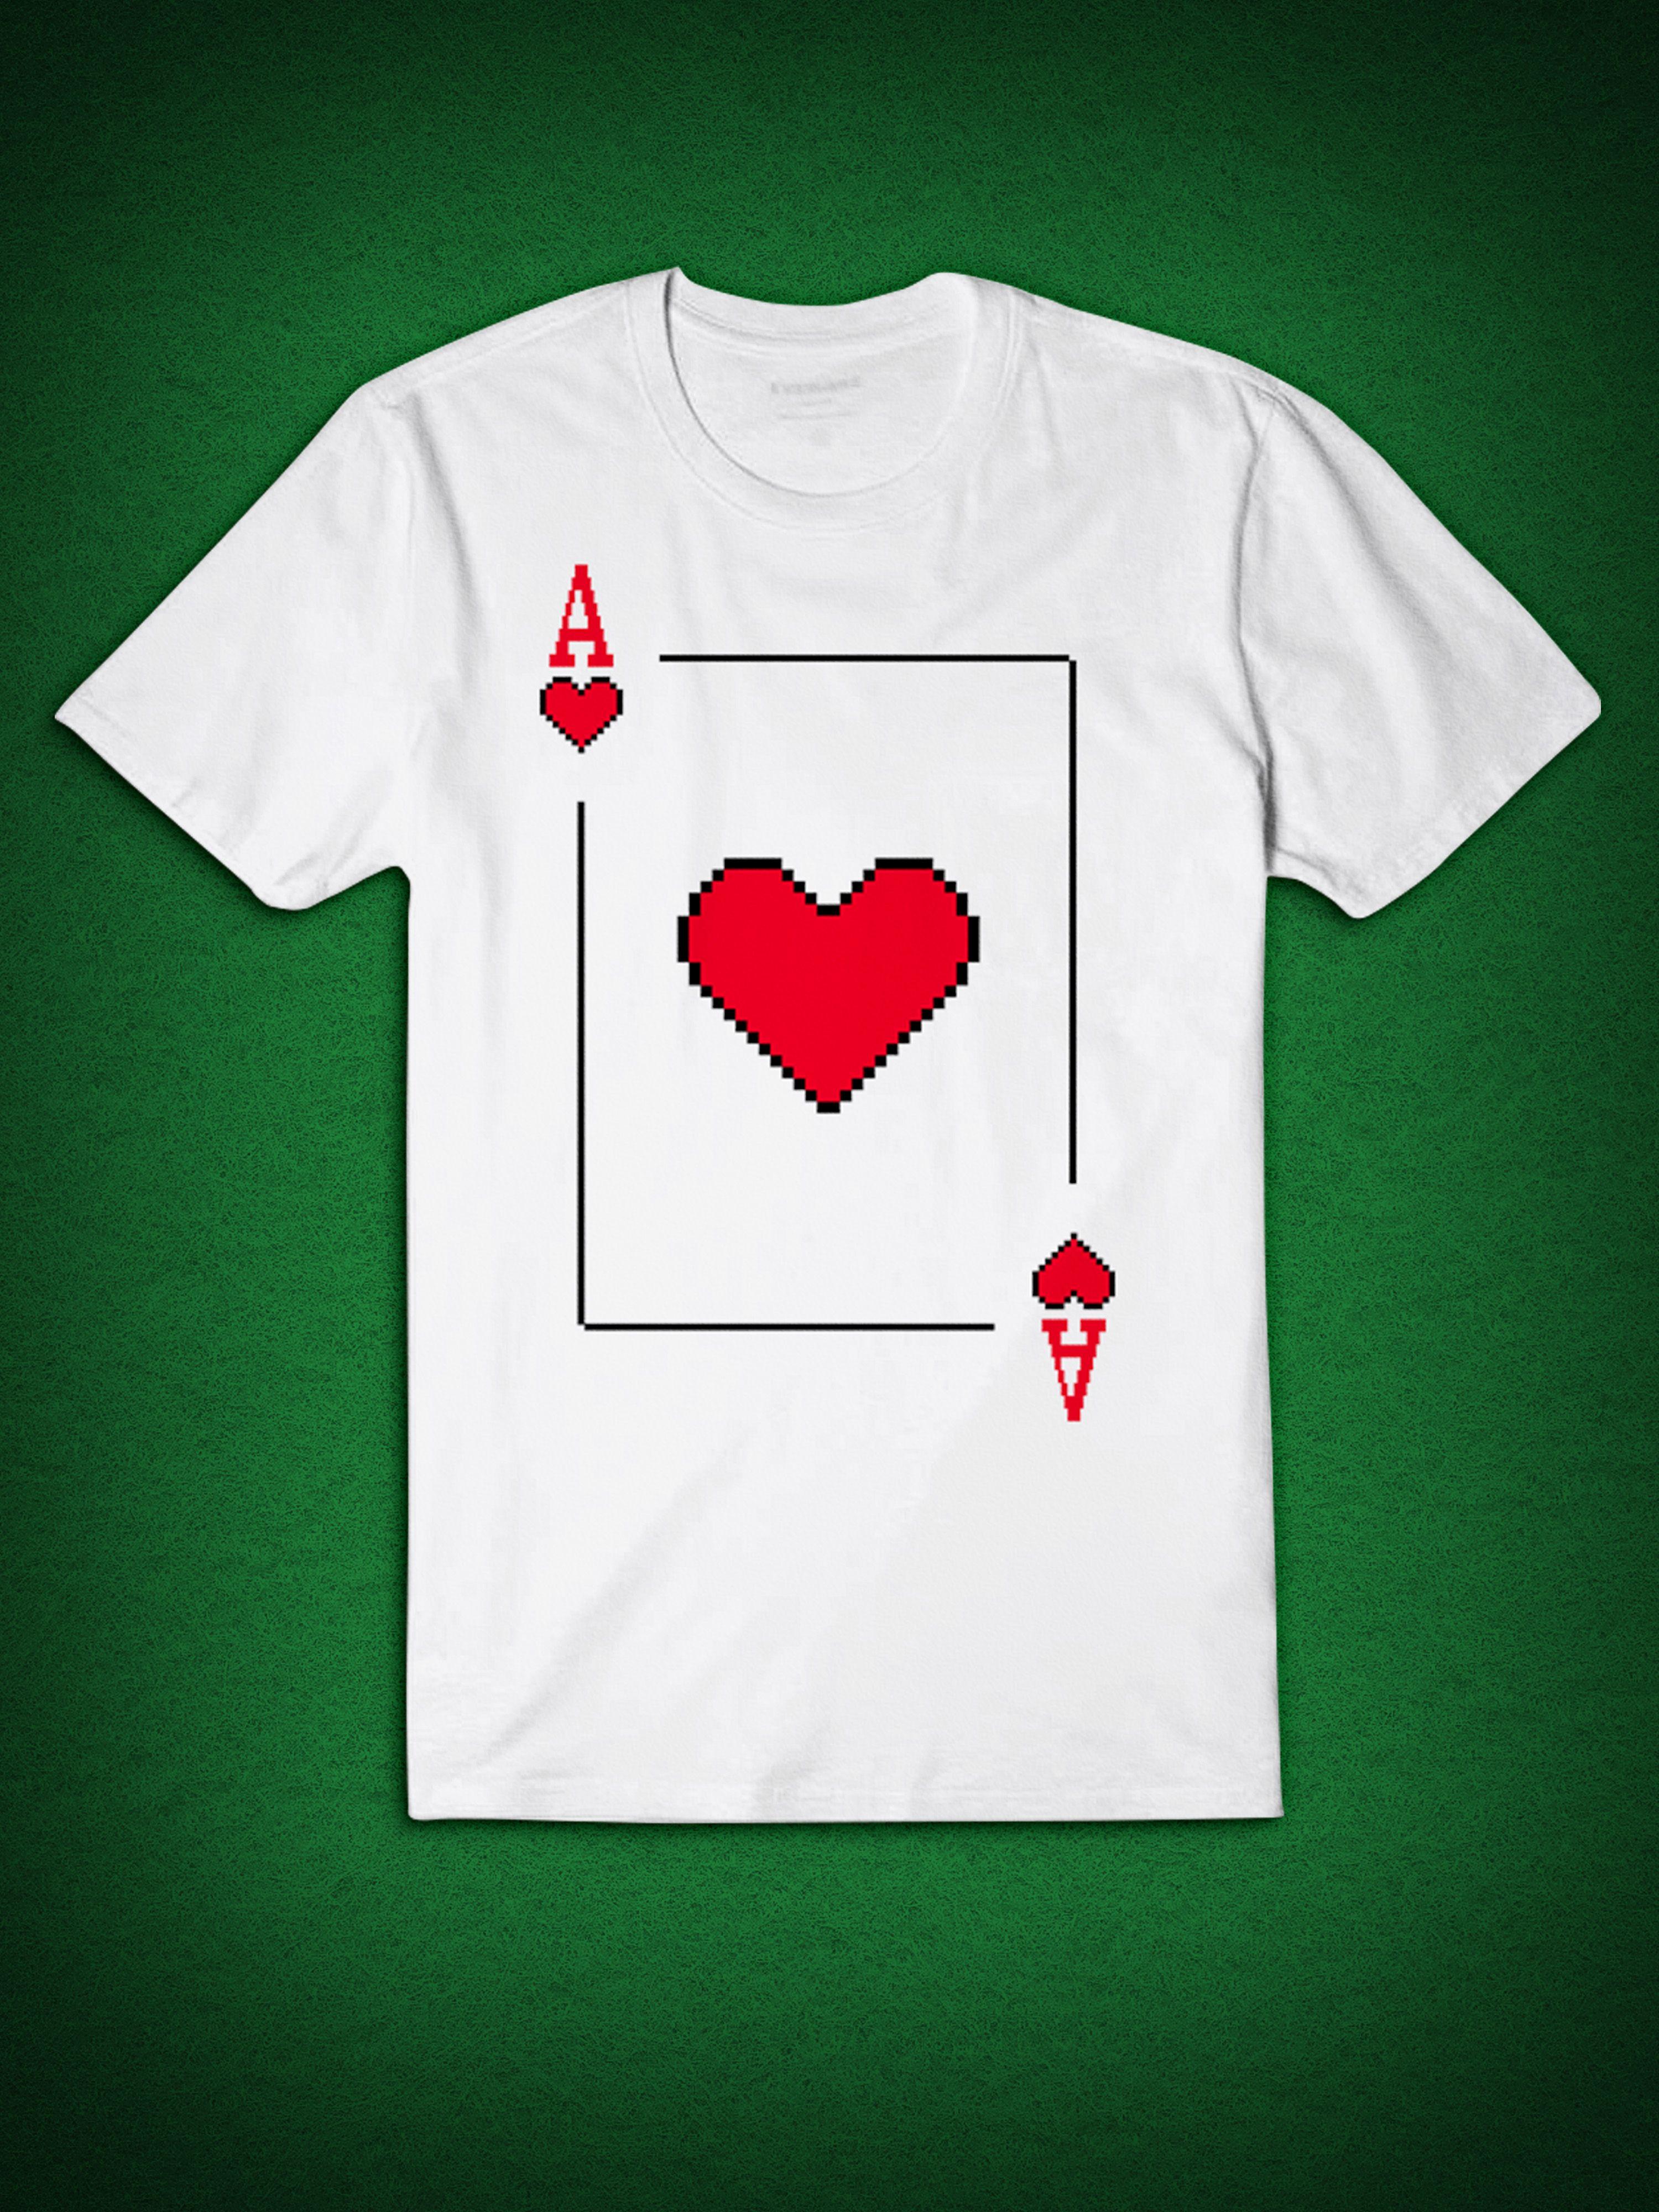 Pixel Ace of Spades Deck Playing Cards Poker Blackjack